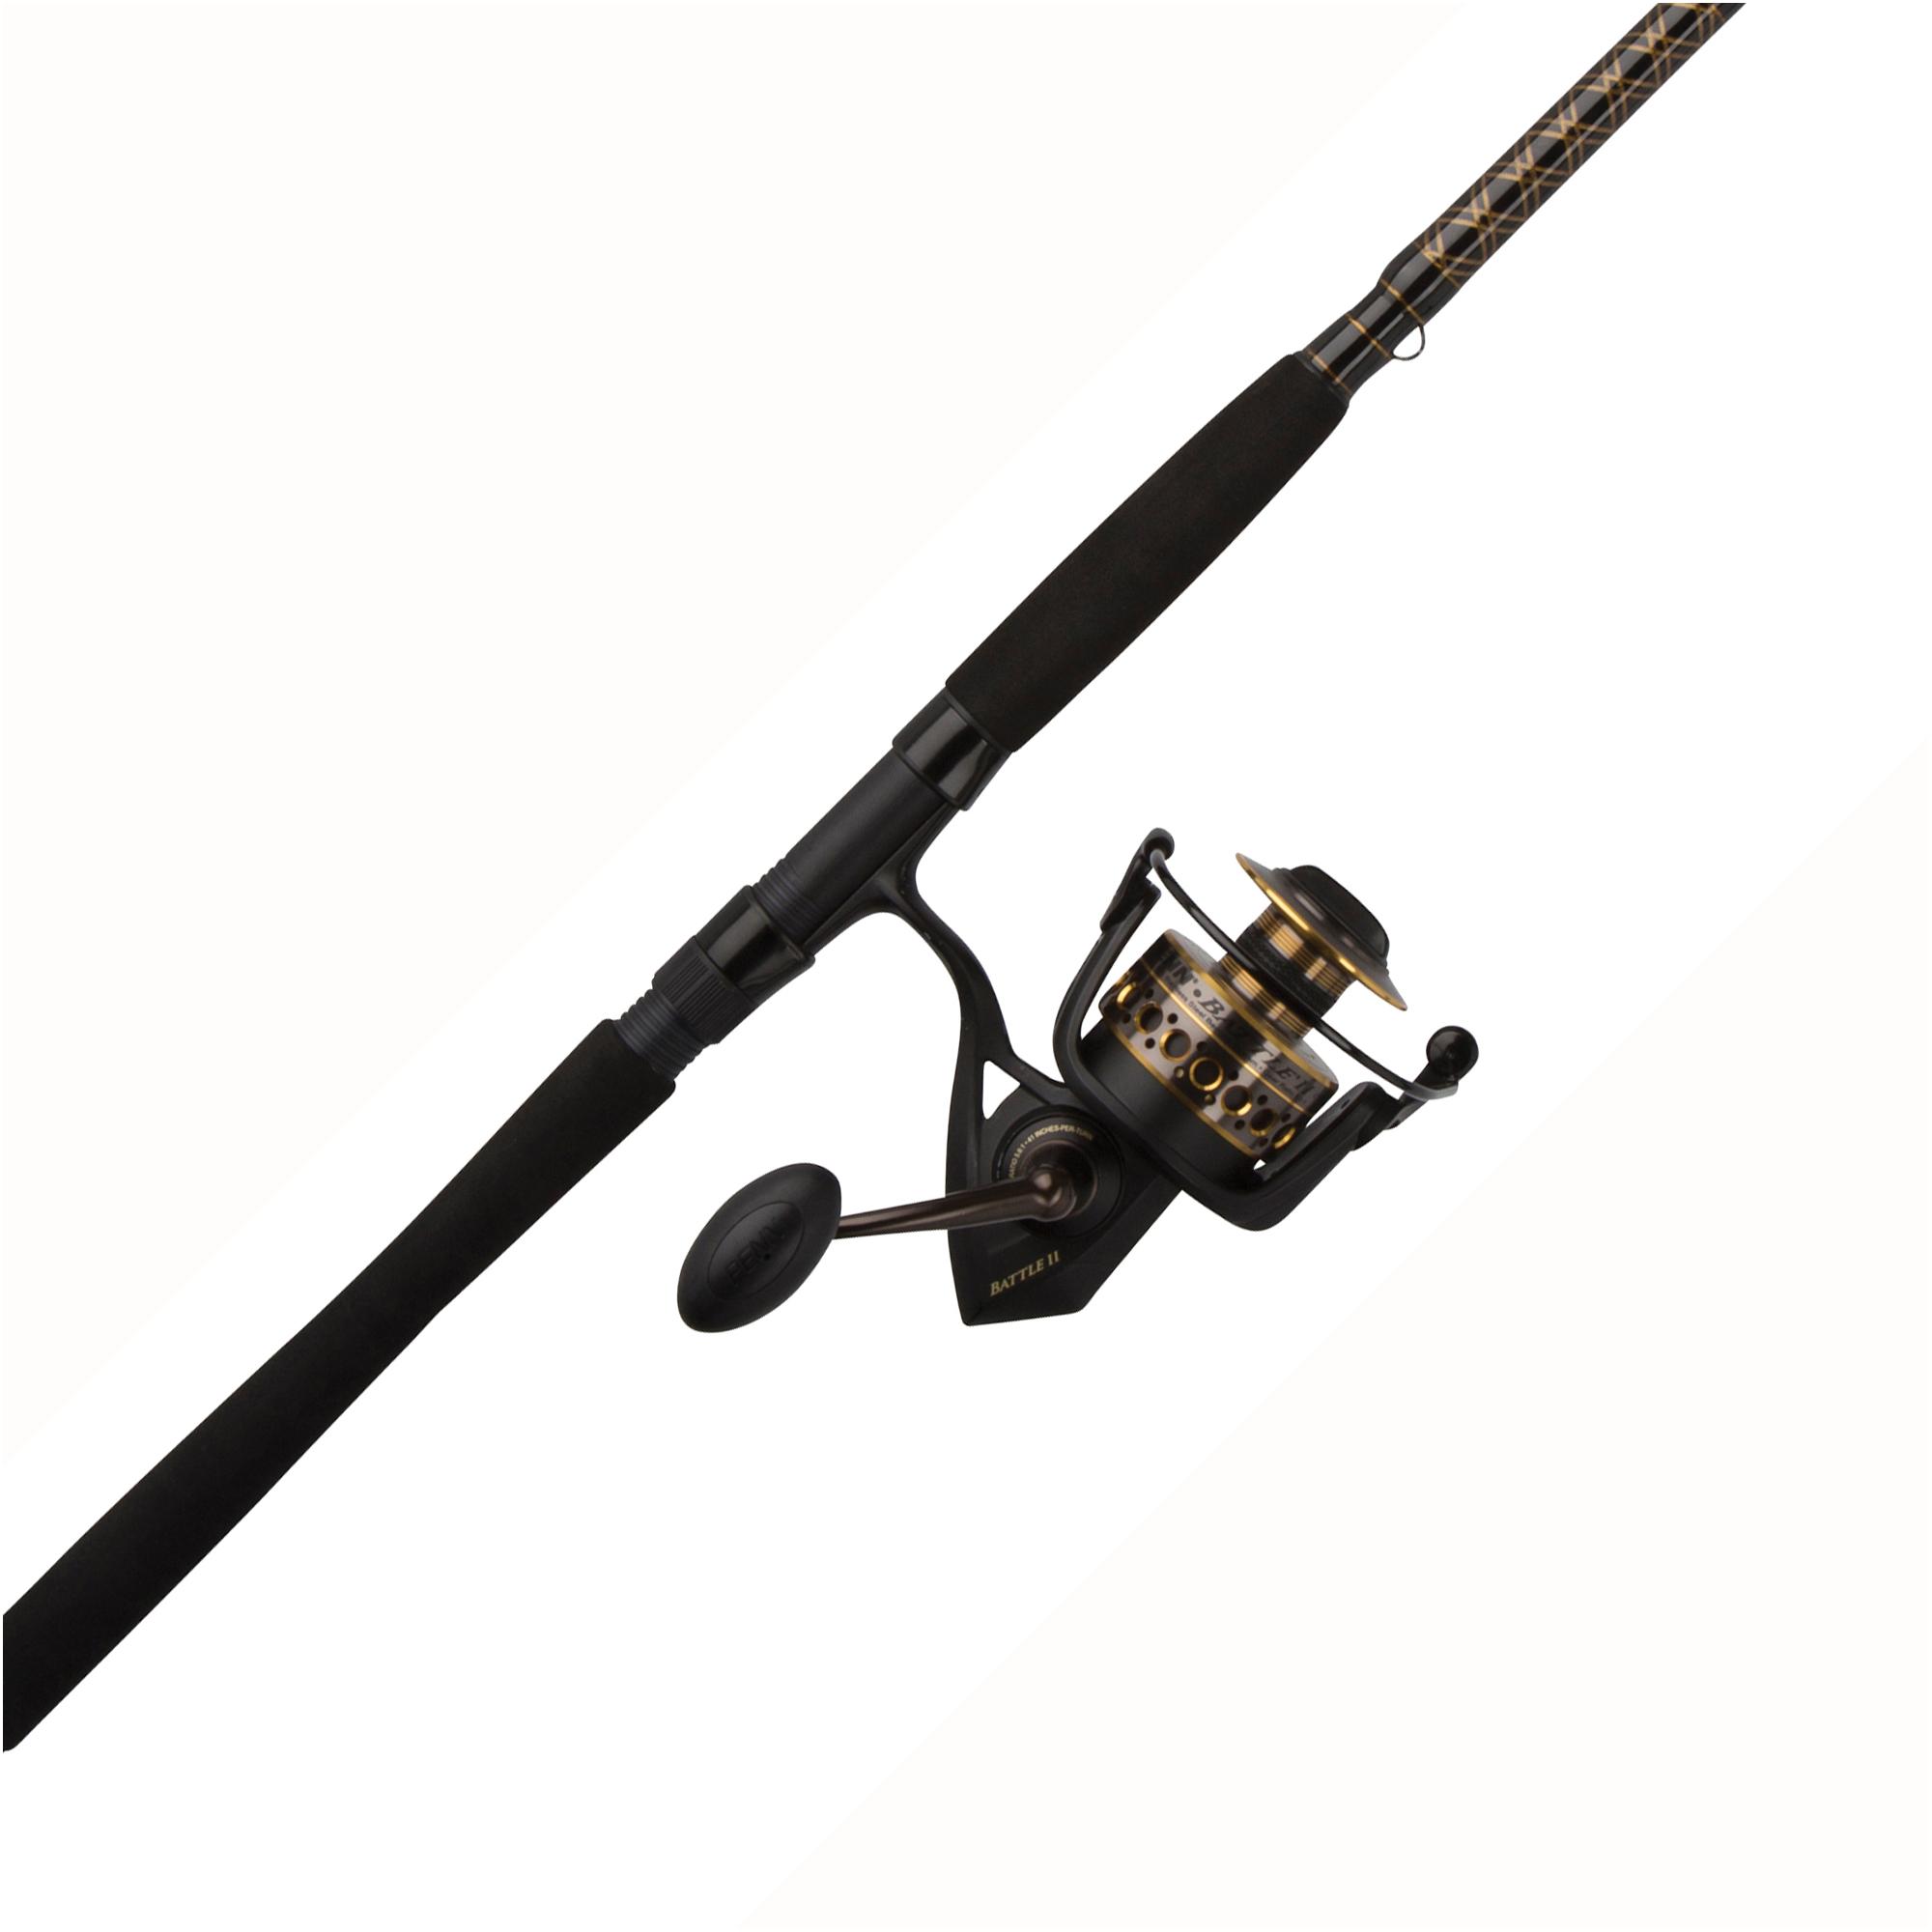 Penn battle ii combo ebay for Fishing combo sale